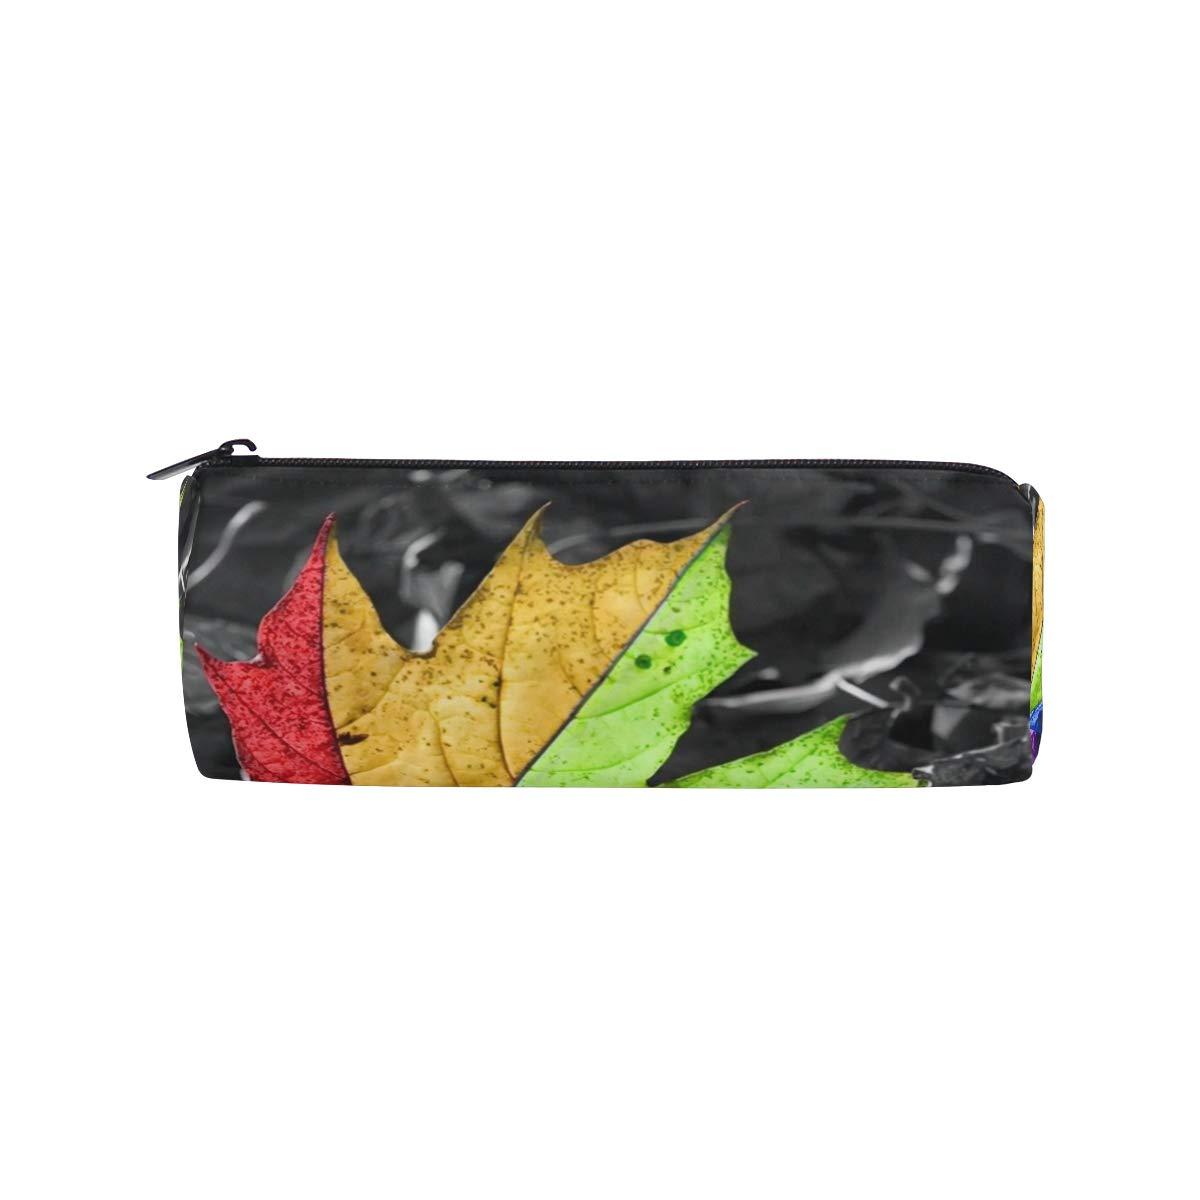 Pencil Pouch Rainbow Leaf and Black Background HD Zipit Cute Pencil Cases School Pen Organizer Holder Womens Makeup Bag